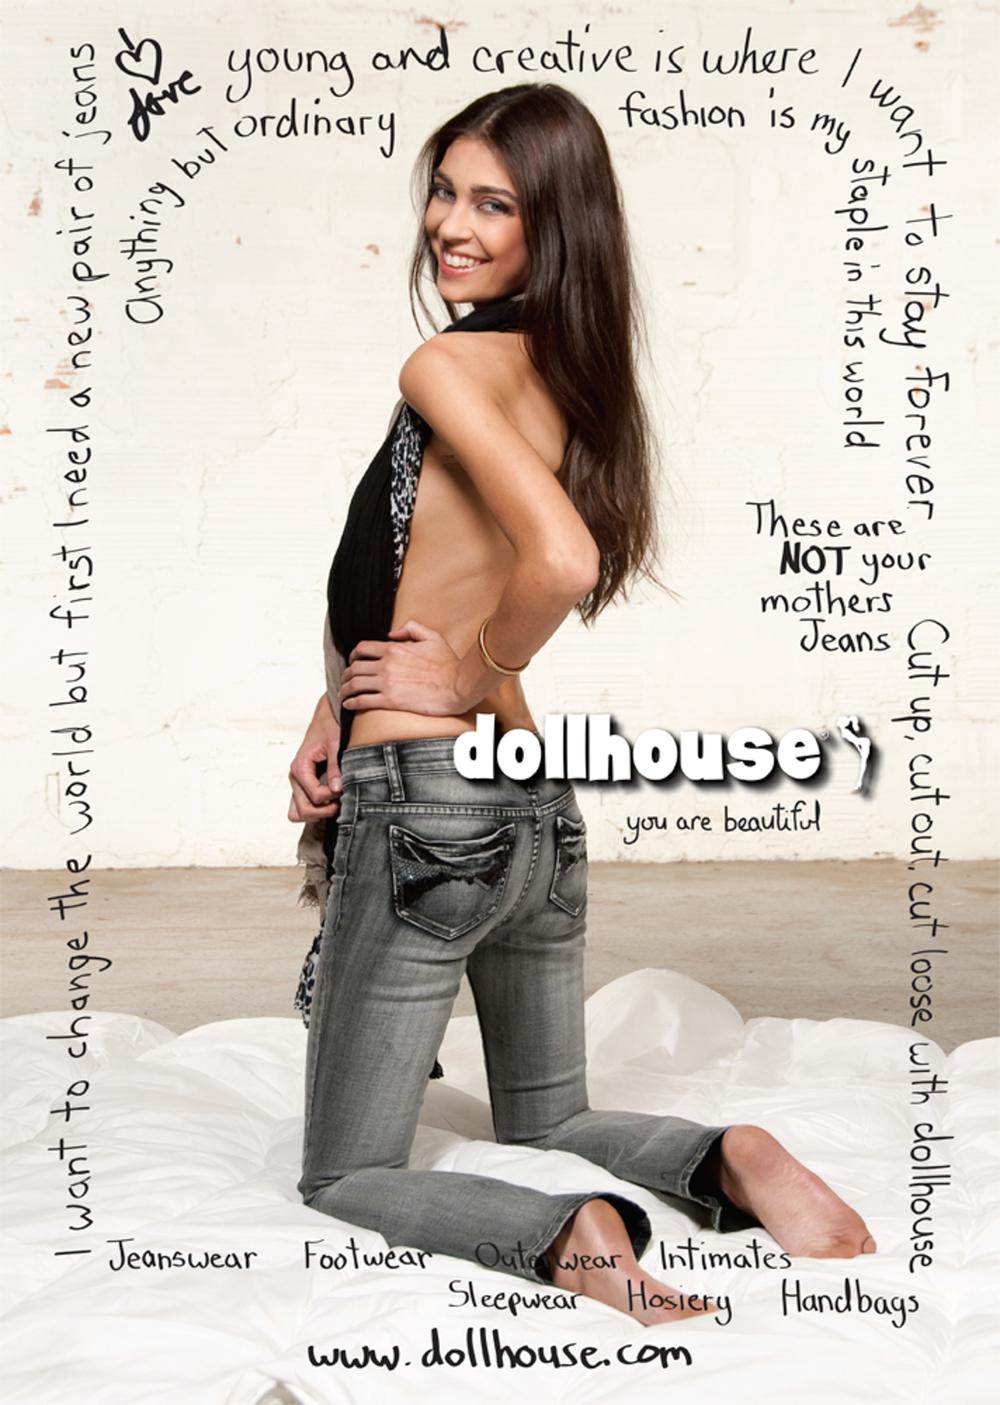 dollhouse-poster-1.jpg